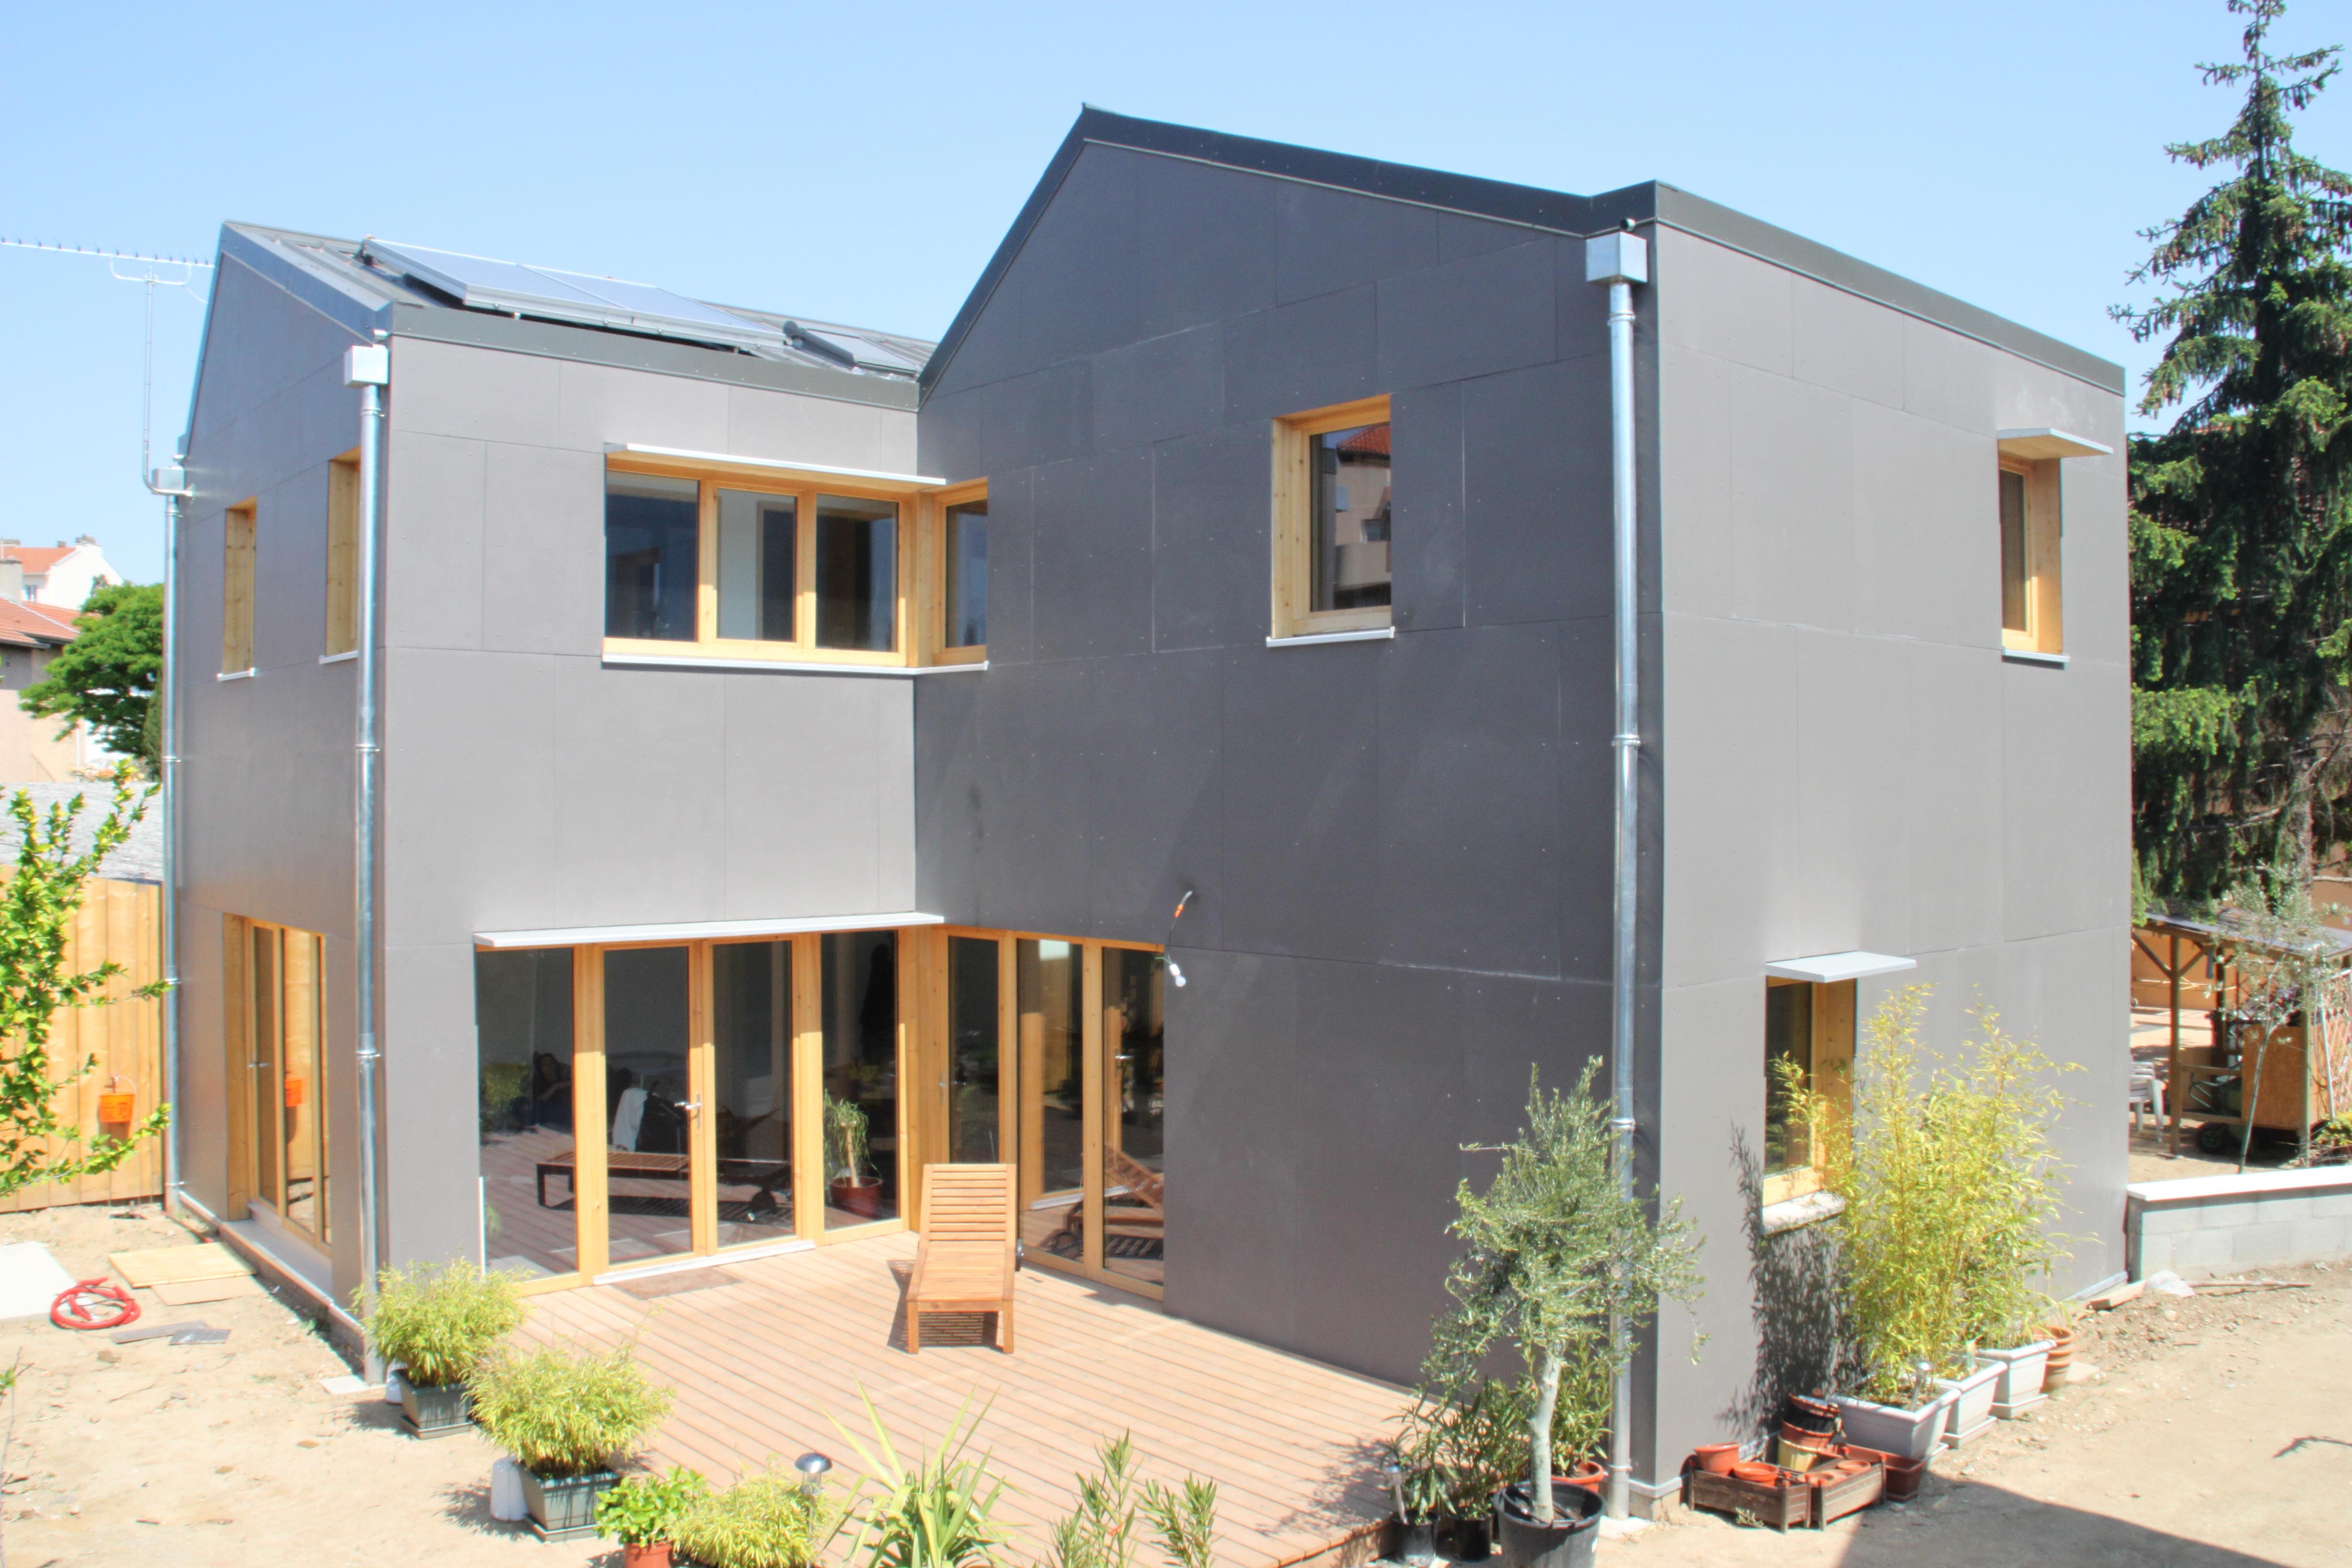 maison-ossature-bois-bardage-fibrociment